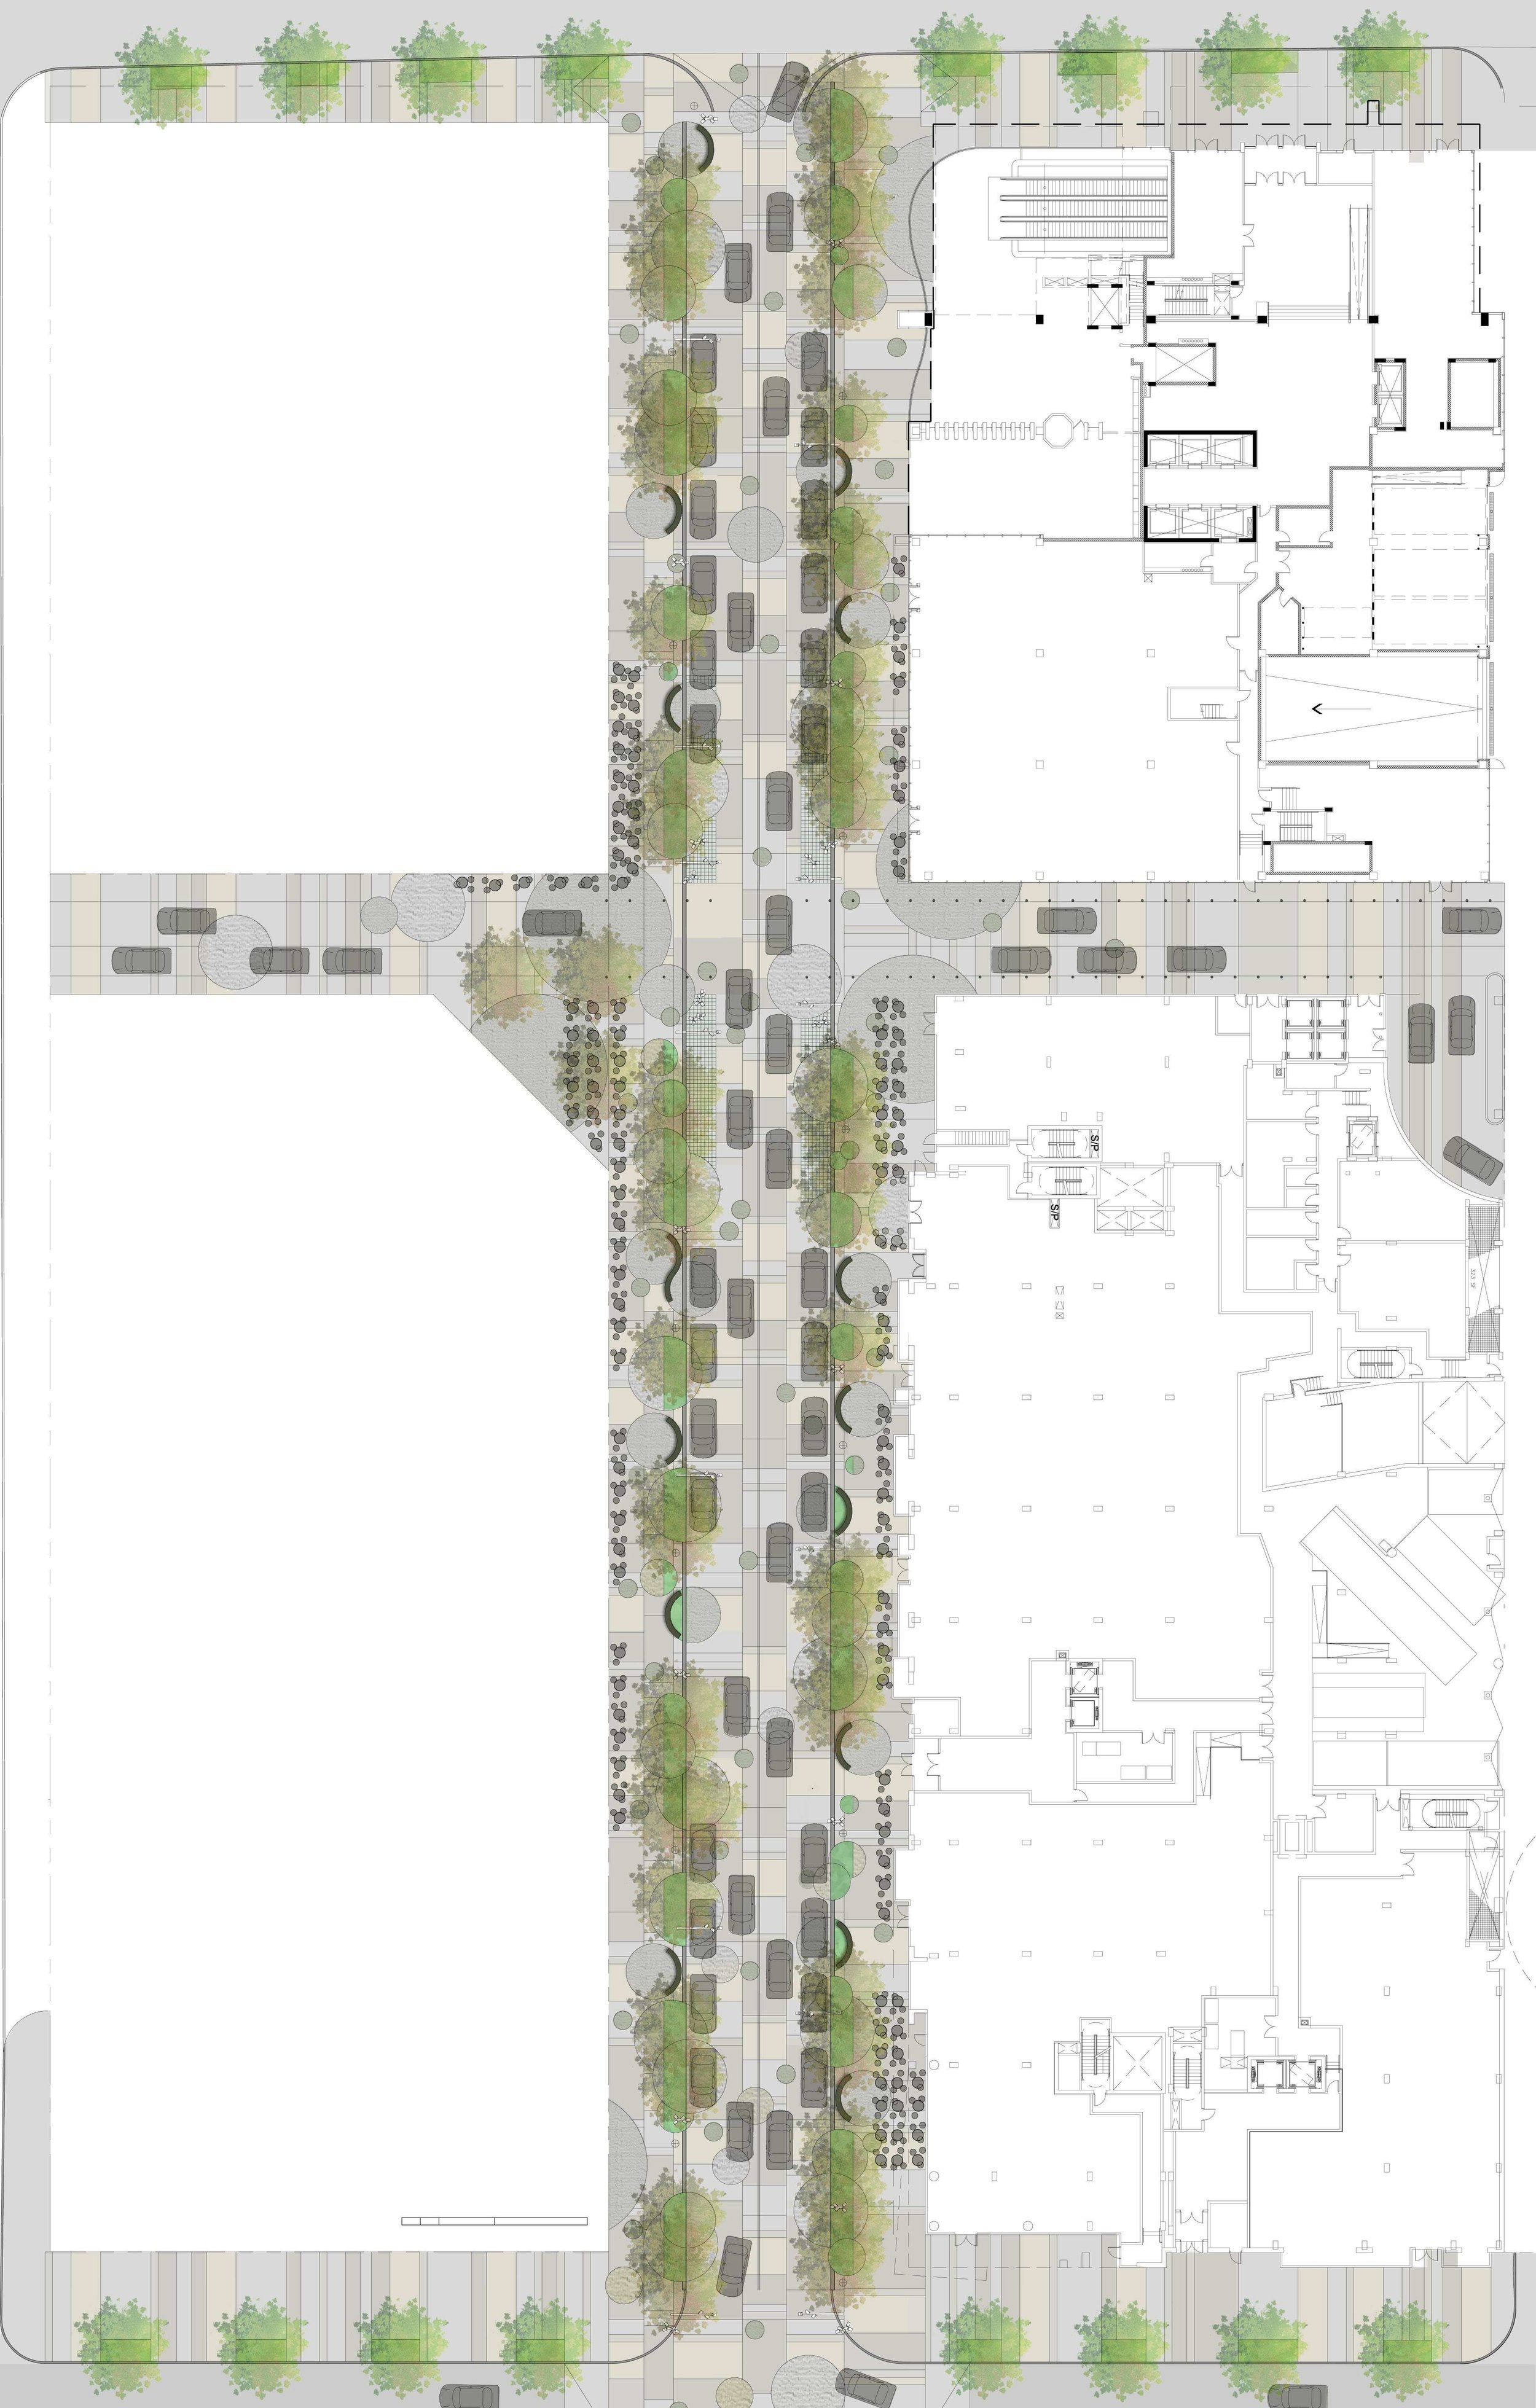 03a-Half Street SE Site Plan-design 2008.jpg